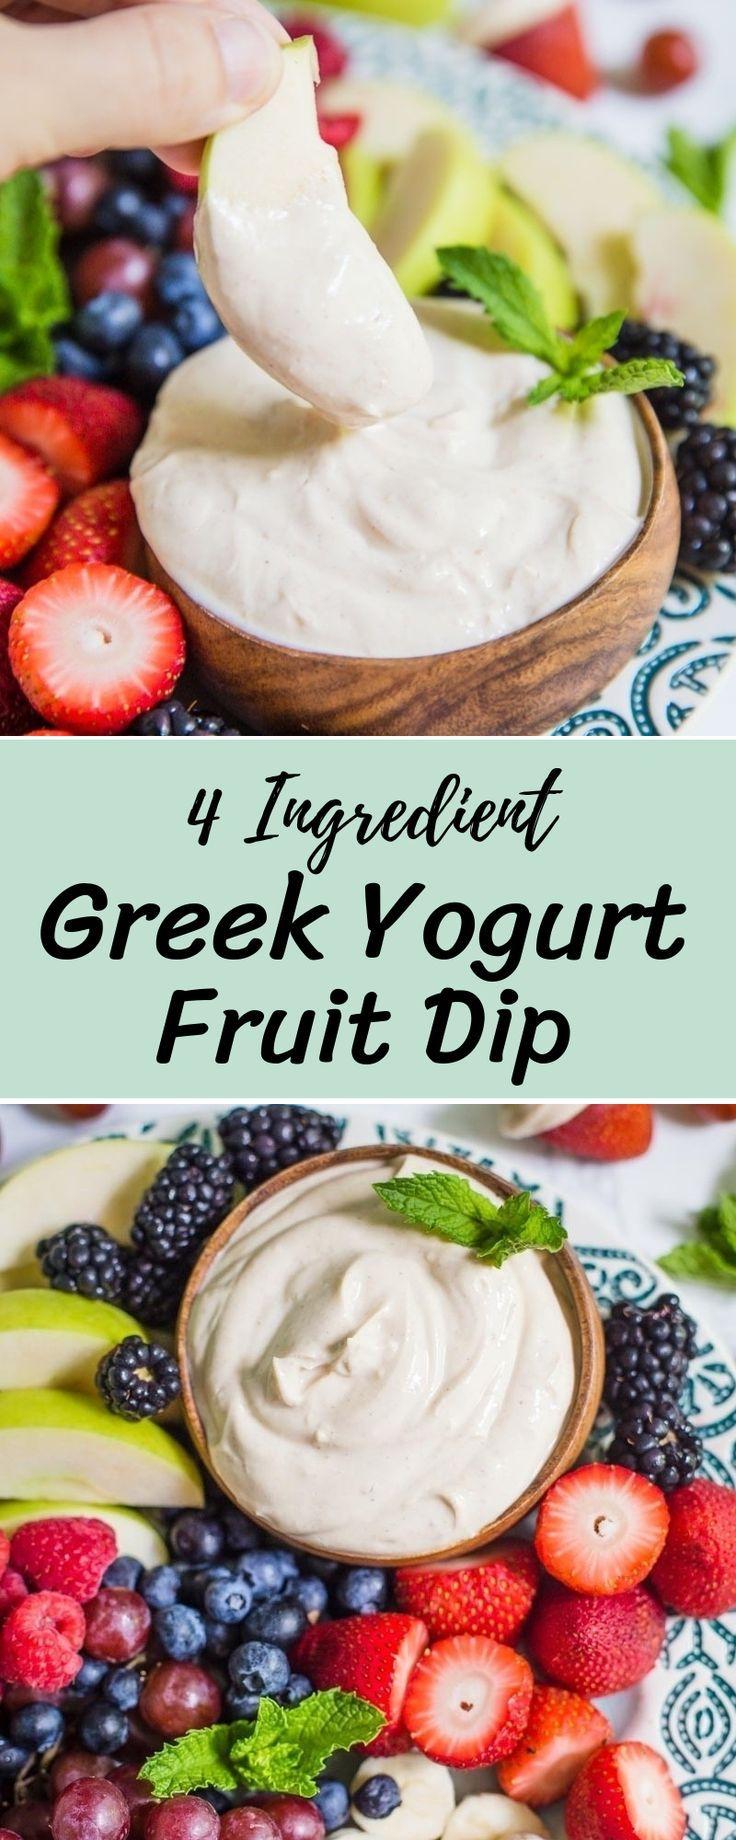 4 Ingredient Greek Yogurt Fruit Dip Recipe Greek Yogurt Recipes Fruit Dips Recipes Greek Yogurt Fruit Dip